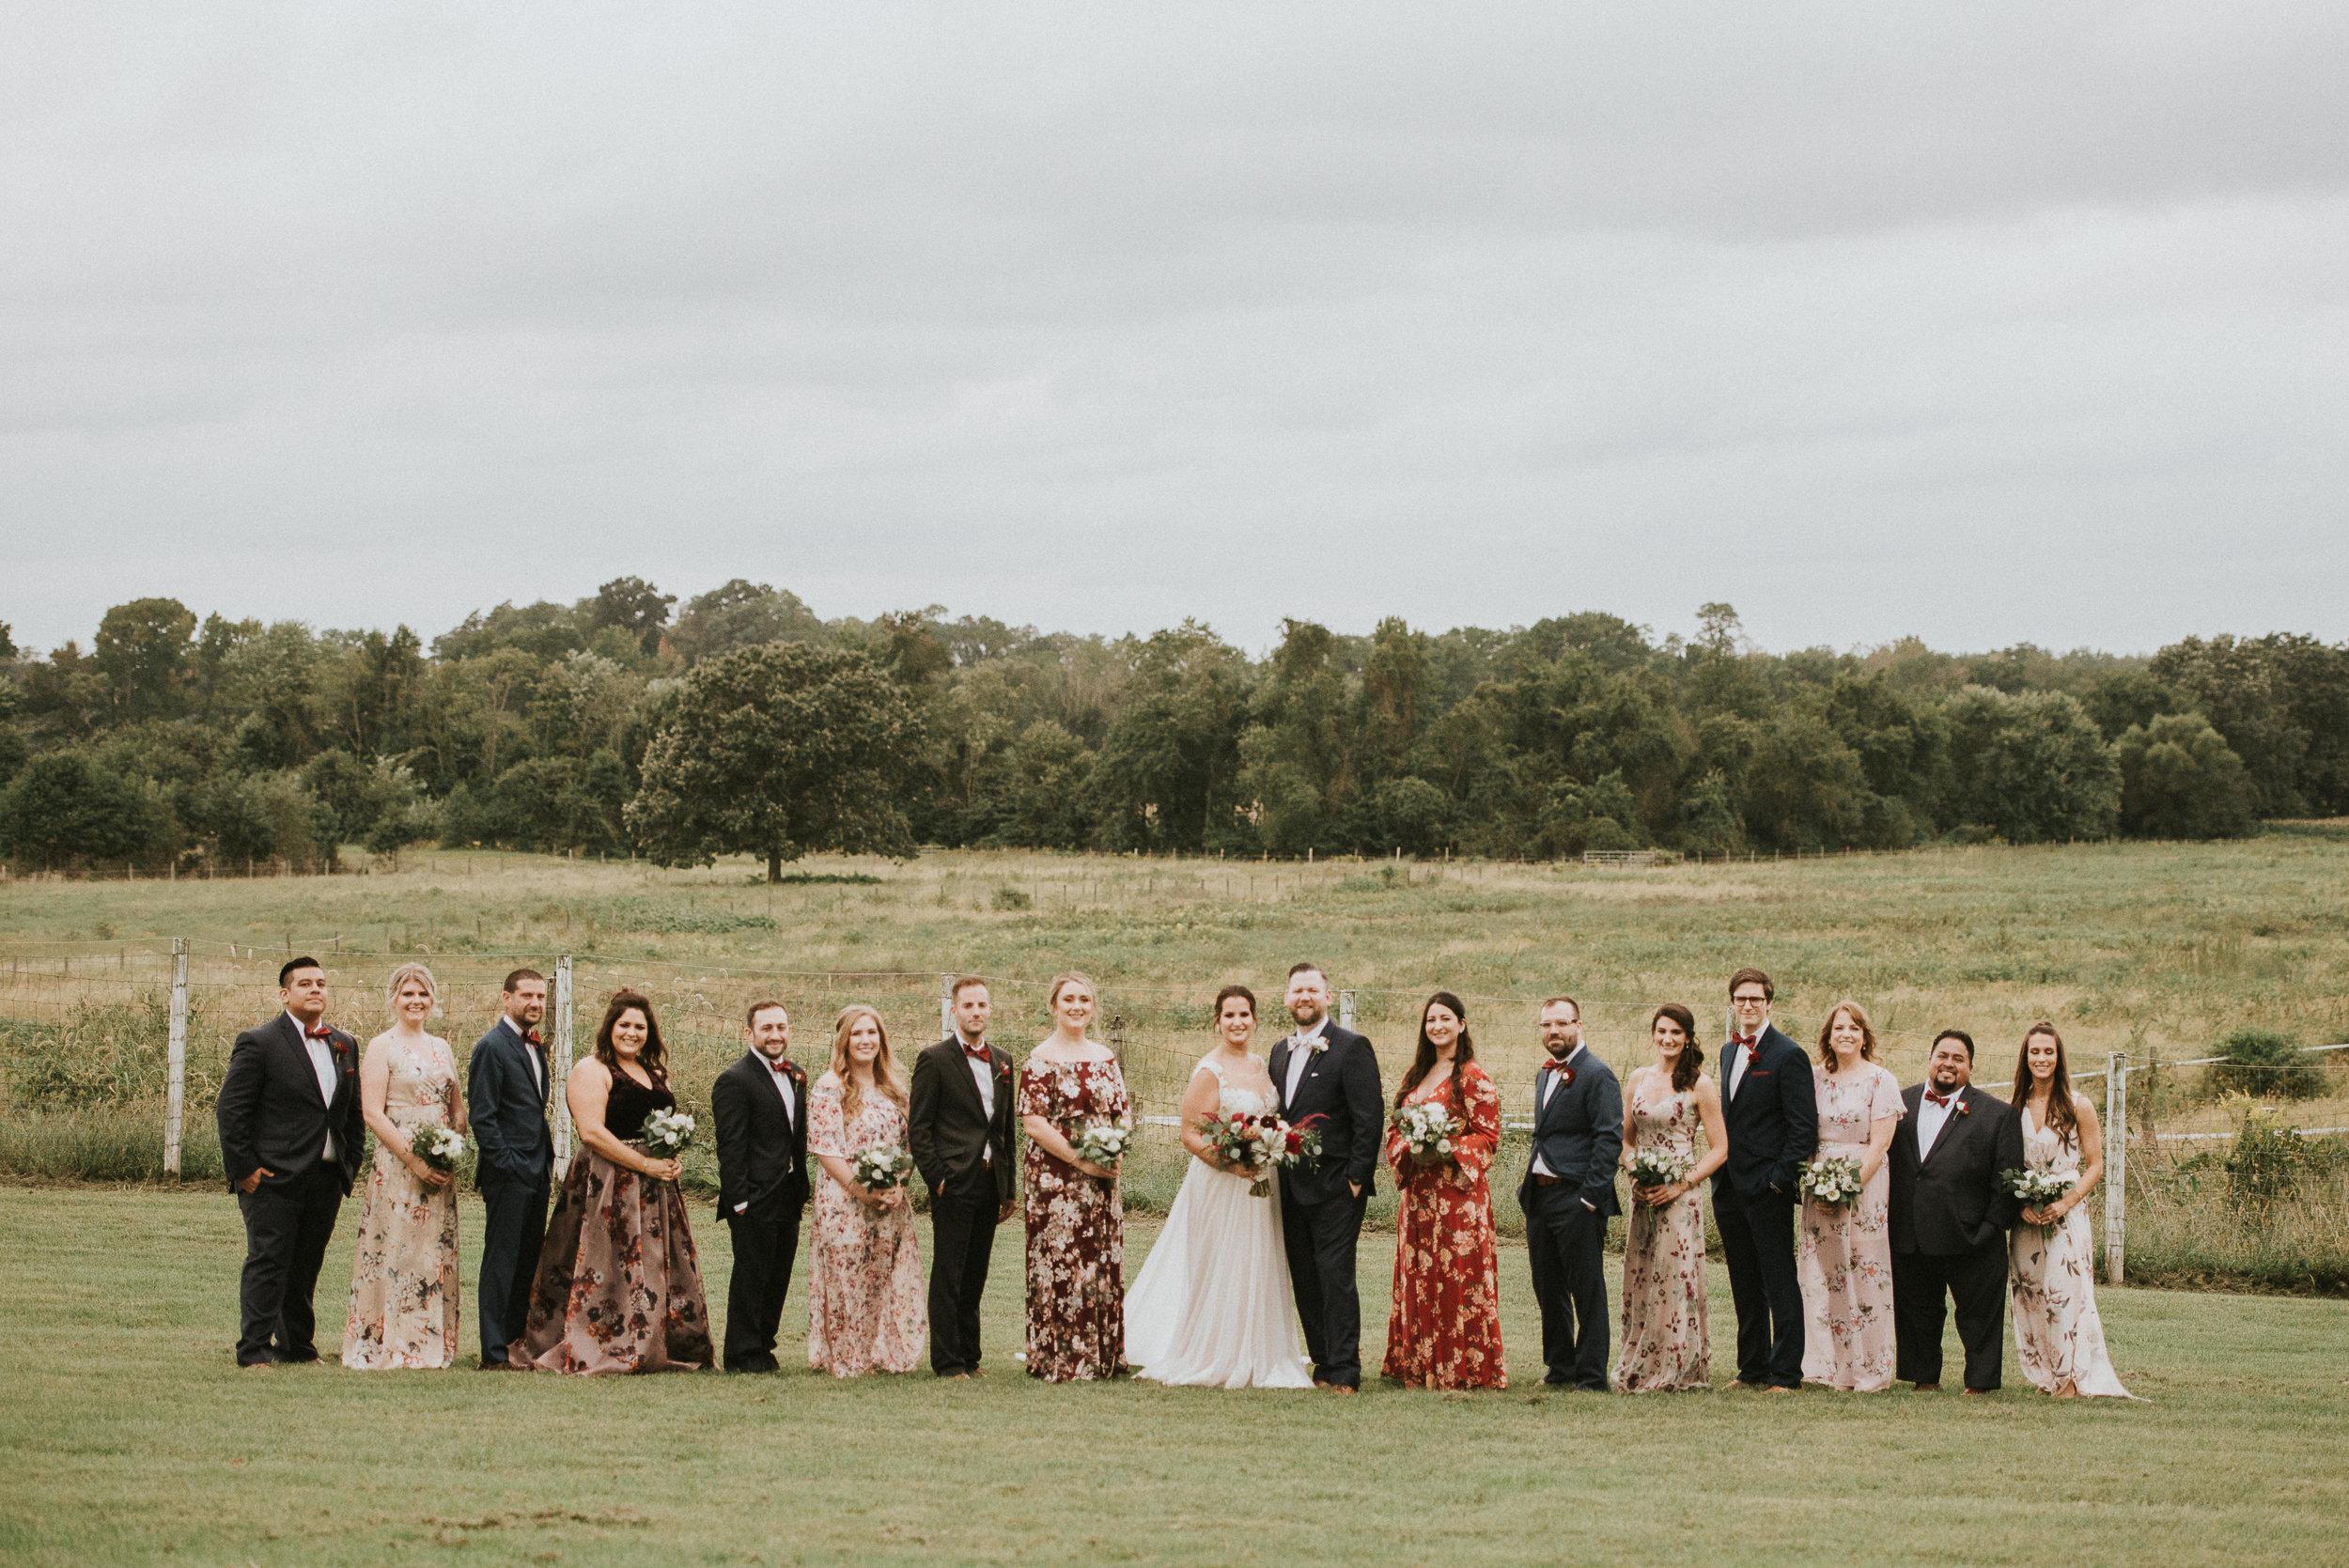 Johnson-Locust-Hall-Farm-Wedding-Christine-Kevin-613.jpg